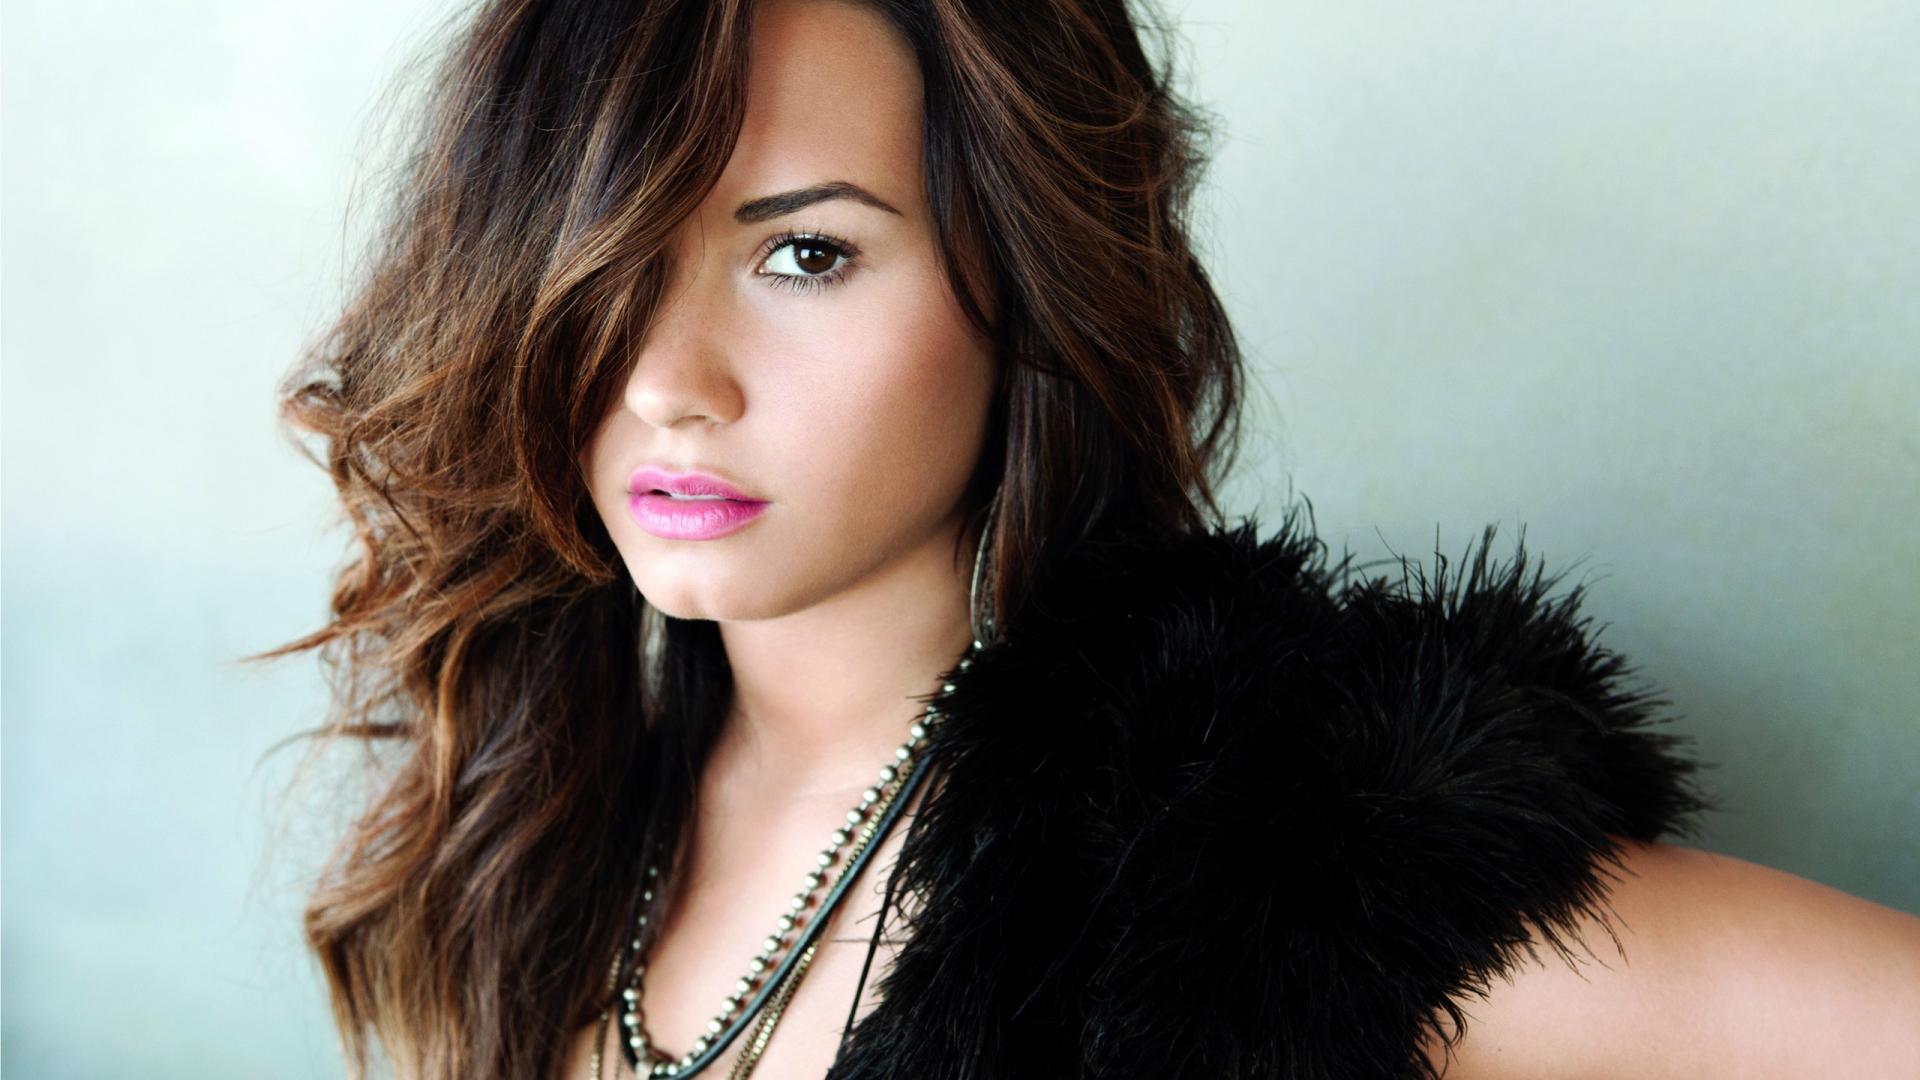 Demi Lovato HD Wallpaper 8007 Wallpaper Wallpaper hd 1920x1080